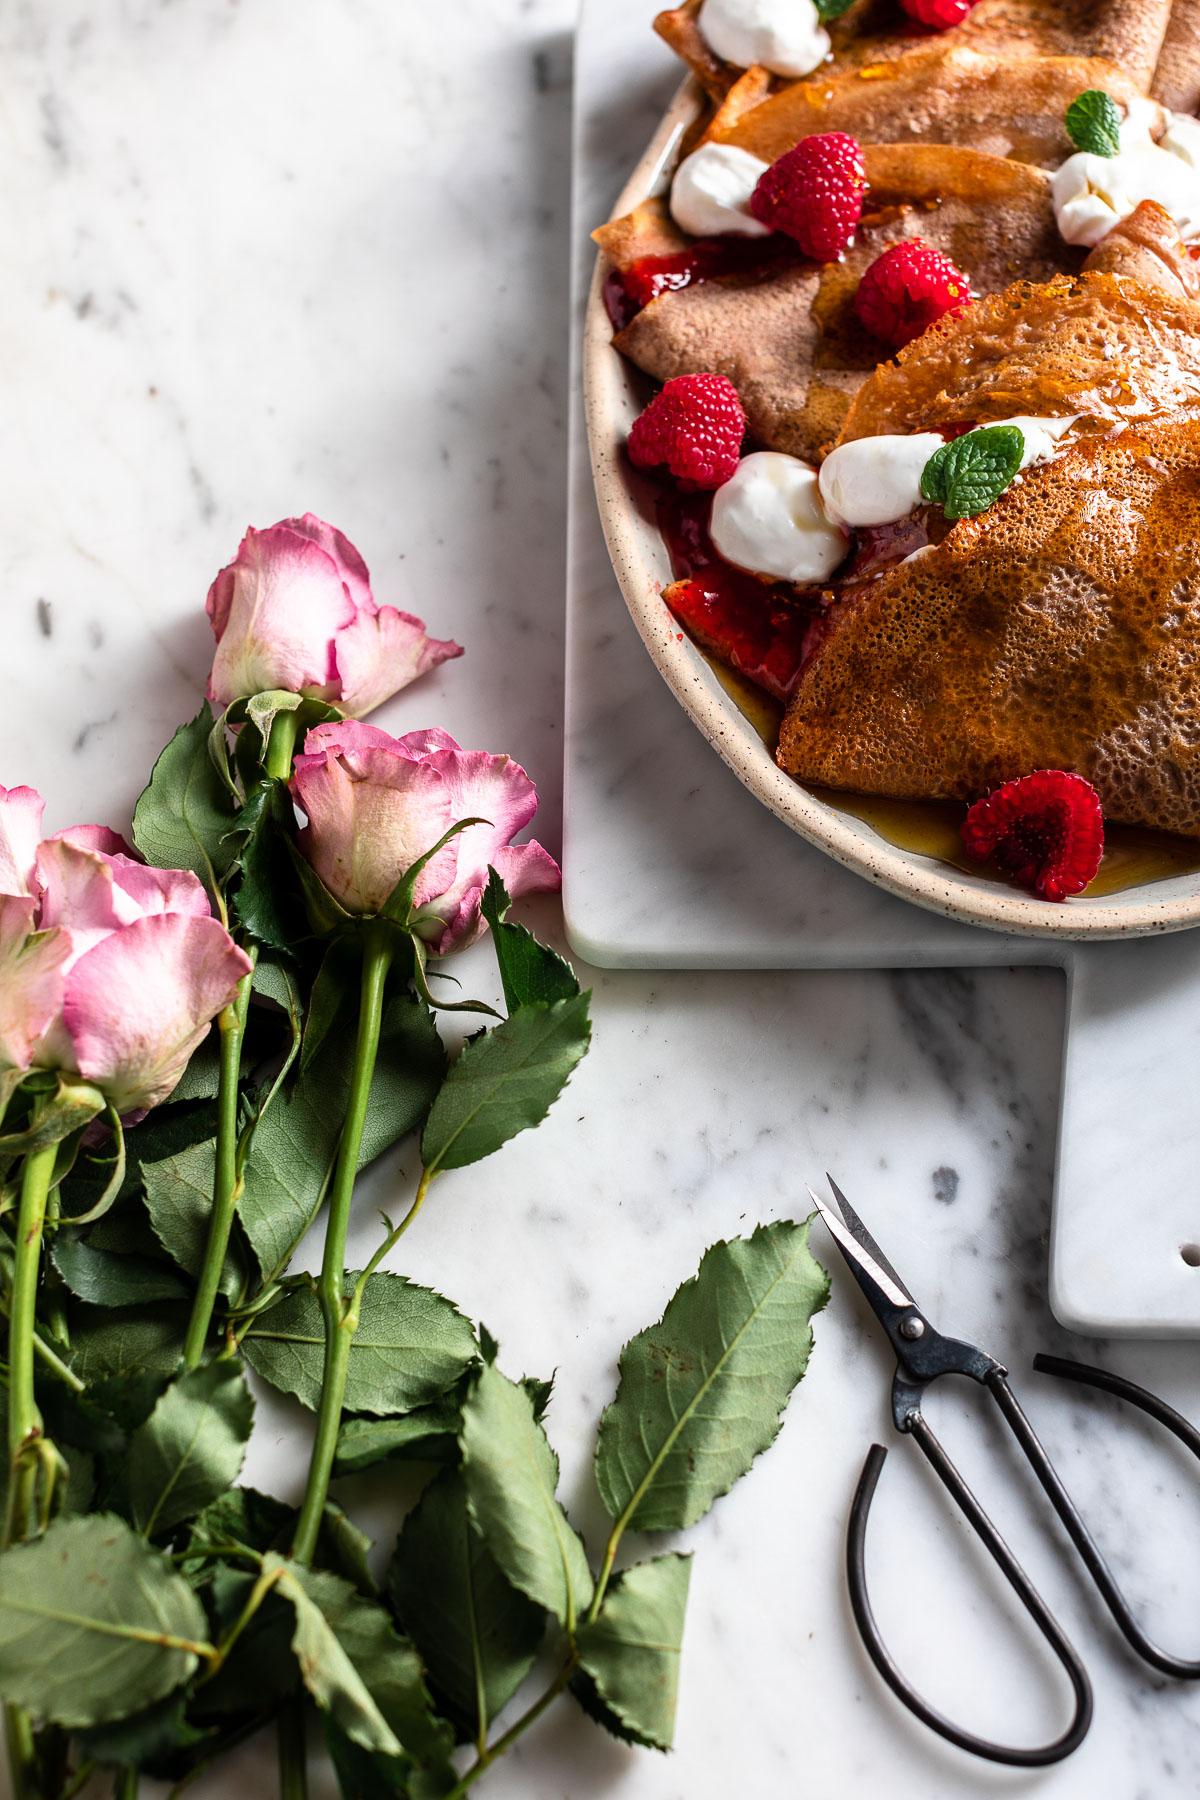 Ricetta CREPES di FARINA di CASTAGNE VEGAN senza glutine Vegan Gluten-free Chestnut Crepes #vegan #photography #crepes